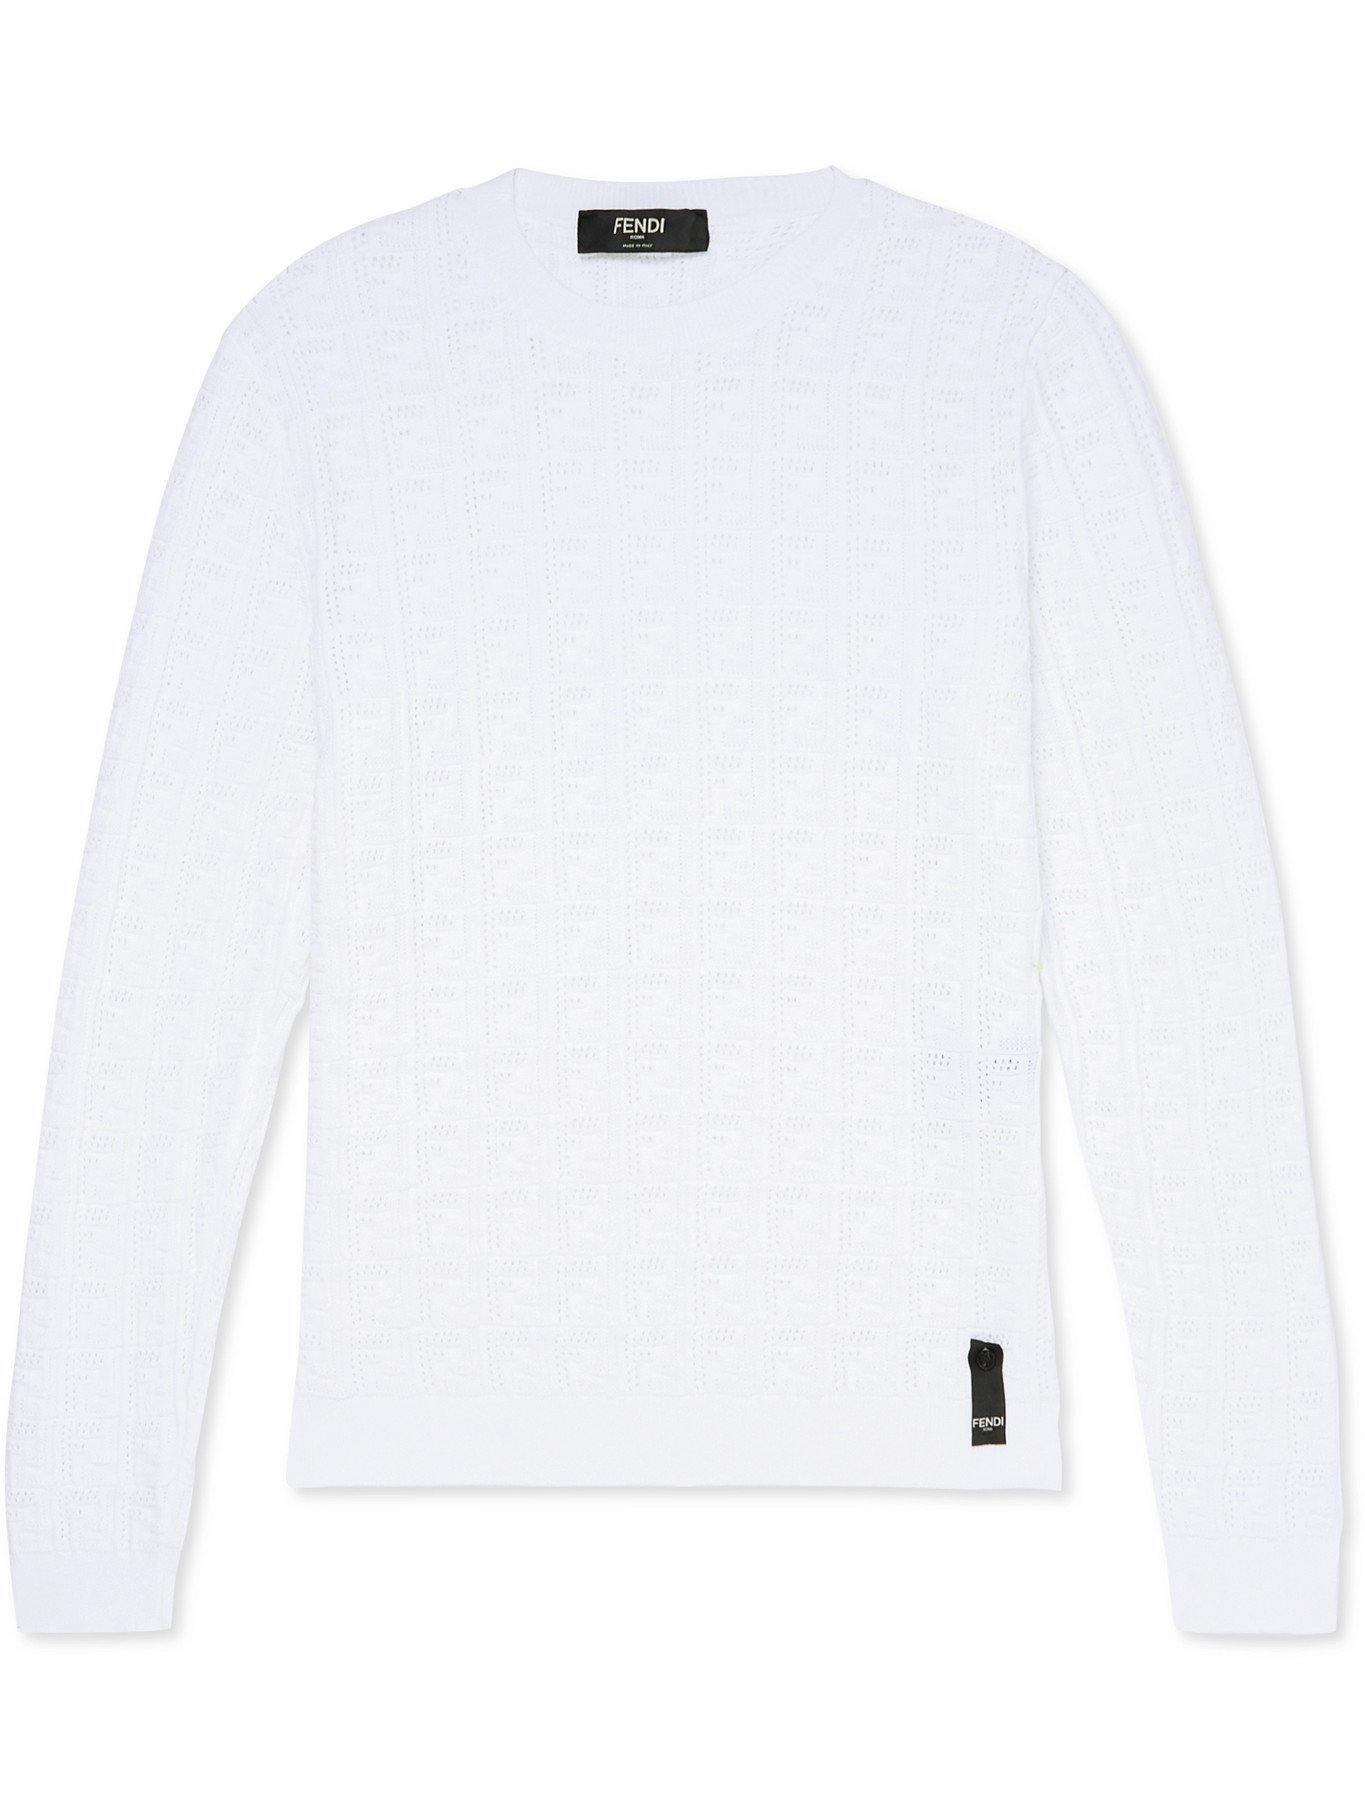 Photo: FENDI - Slim-Fit Monogram-Knit Sweater - White